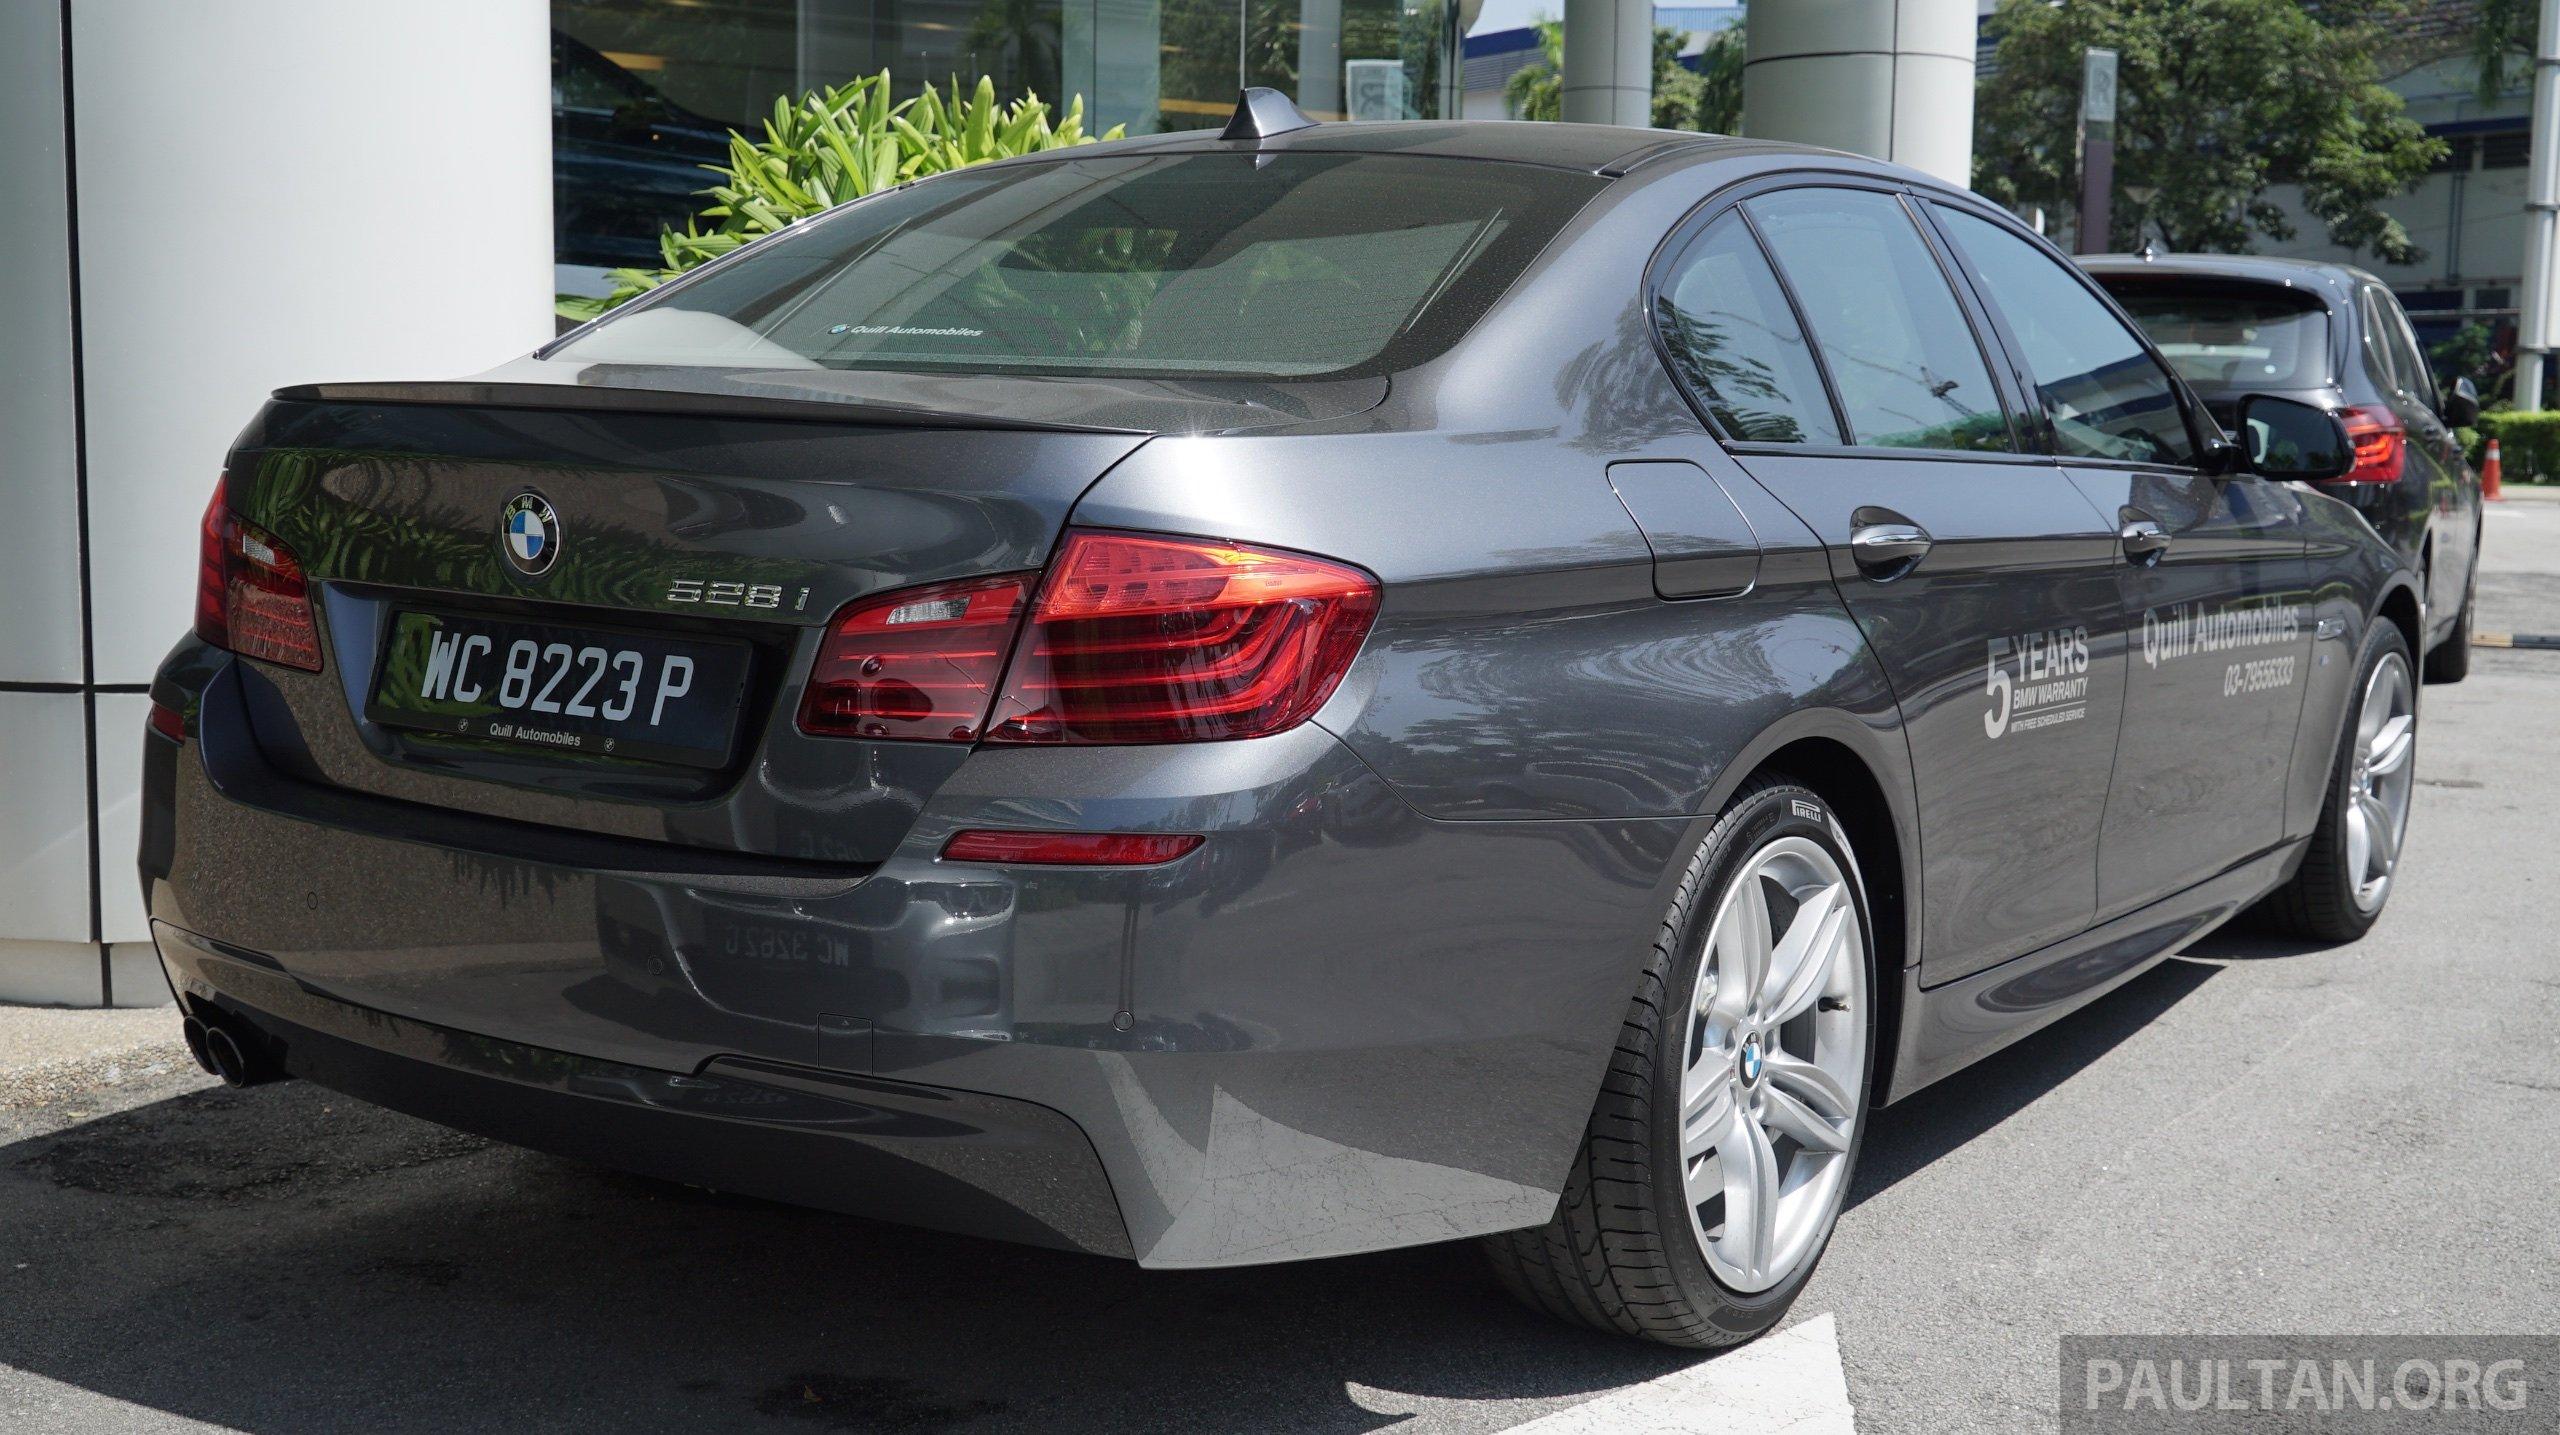 BMW D M Sport I M Sport I M Sport All Updated In - 528i bmw price